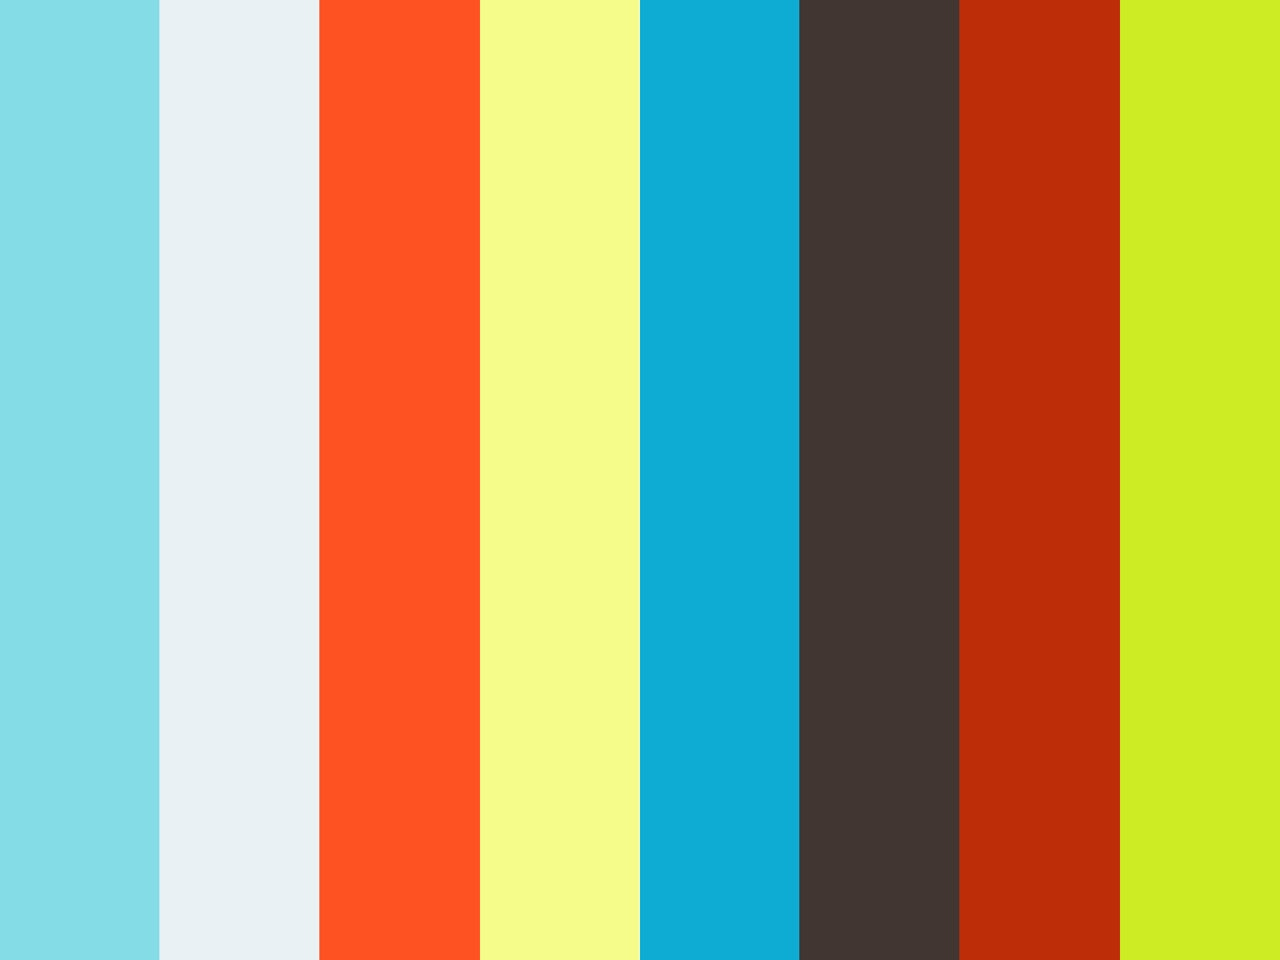 002929 - SNTV - Burgelijke stand op afspraak